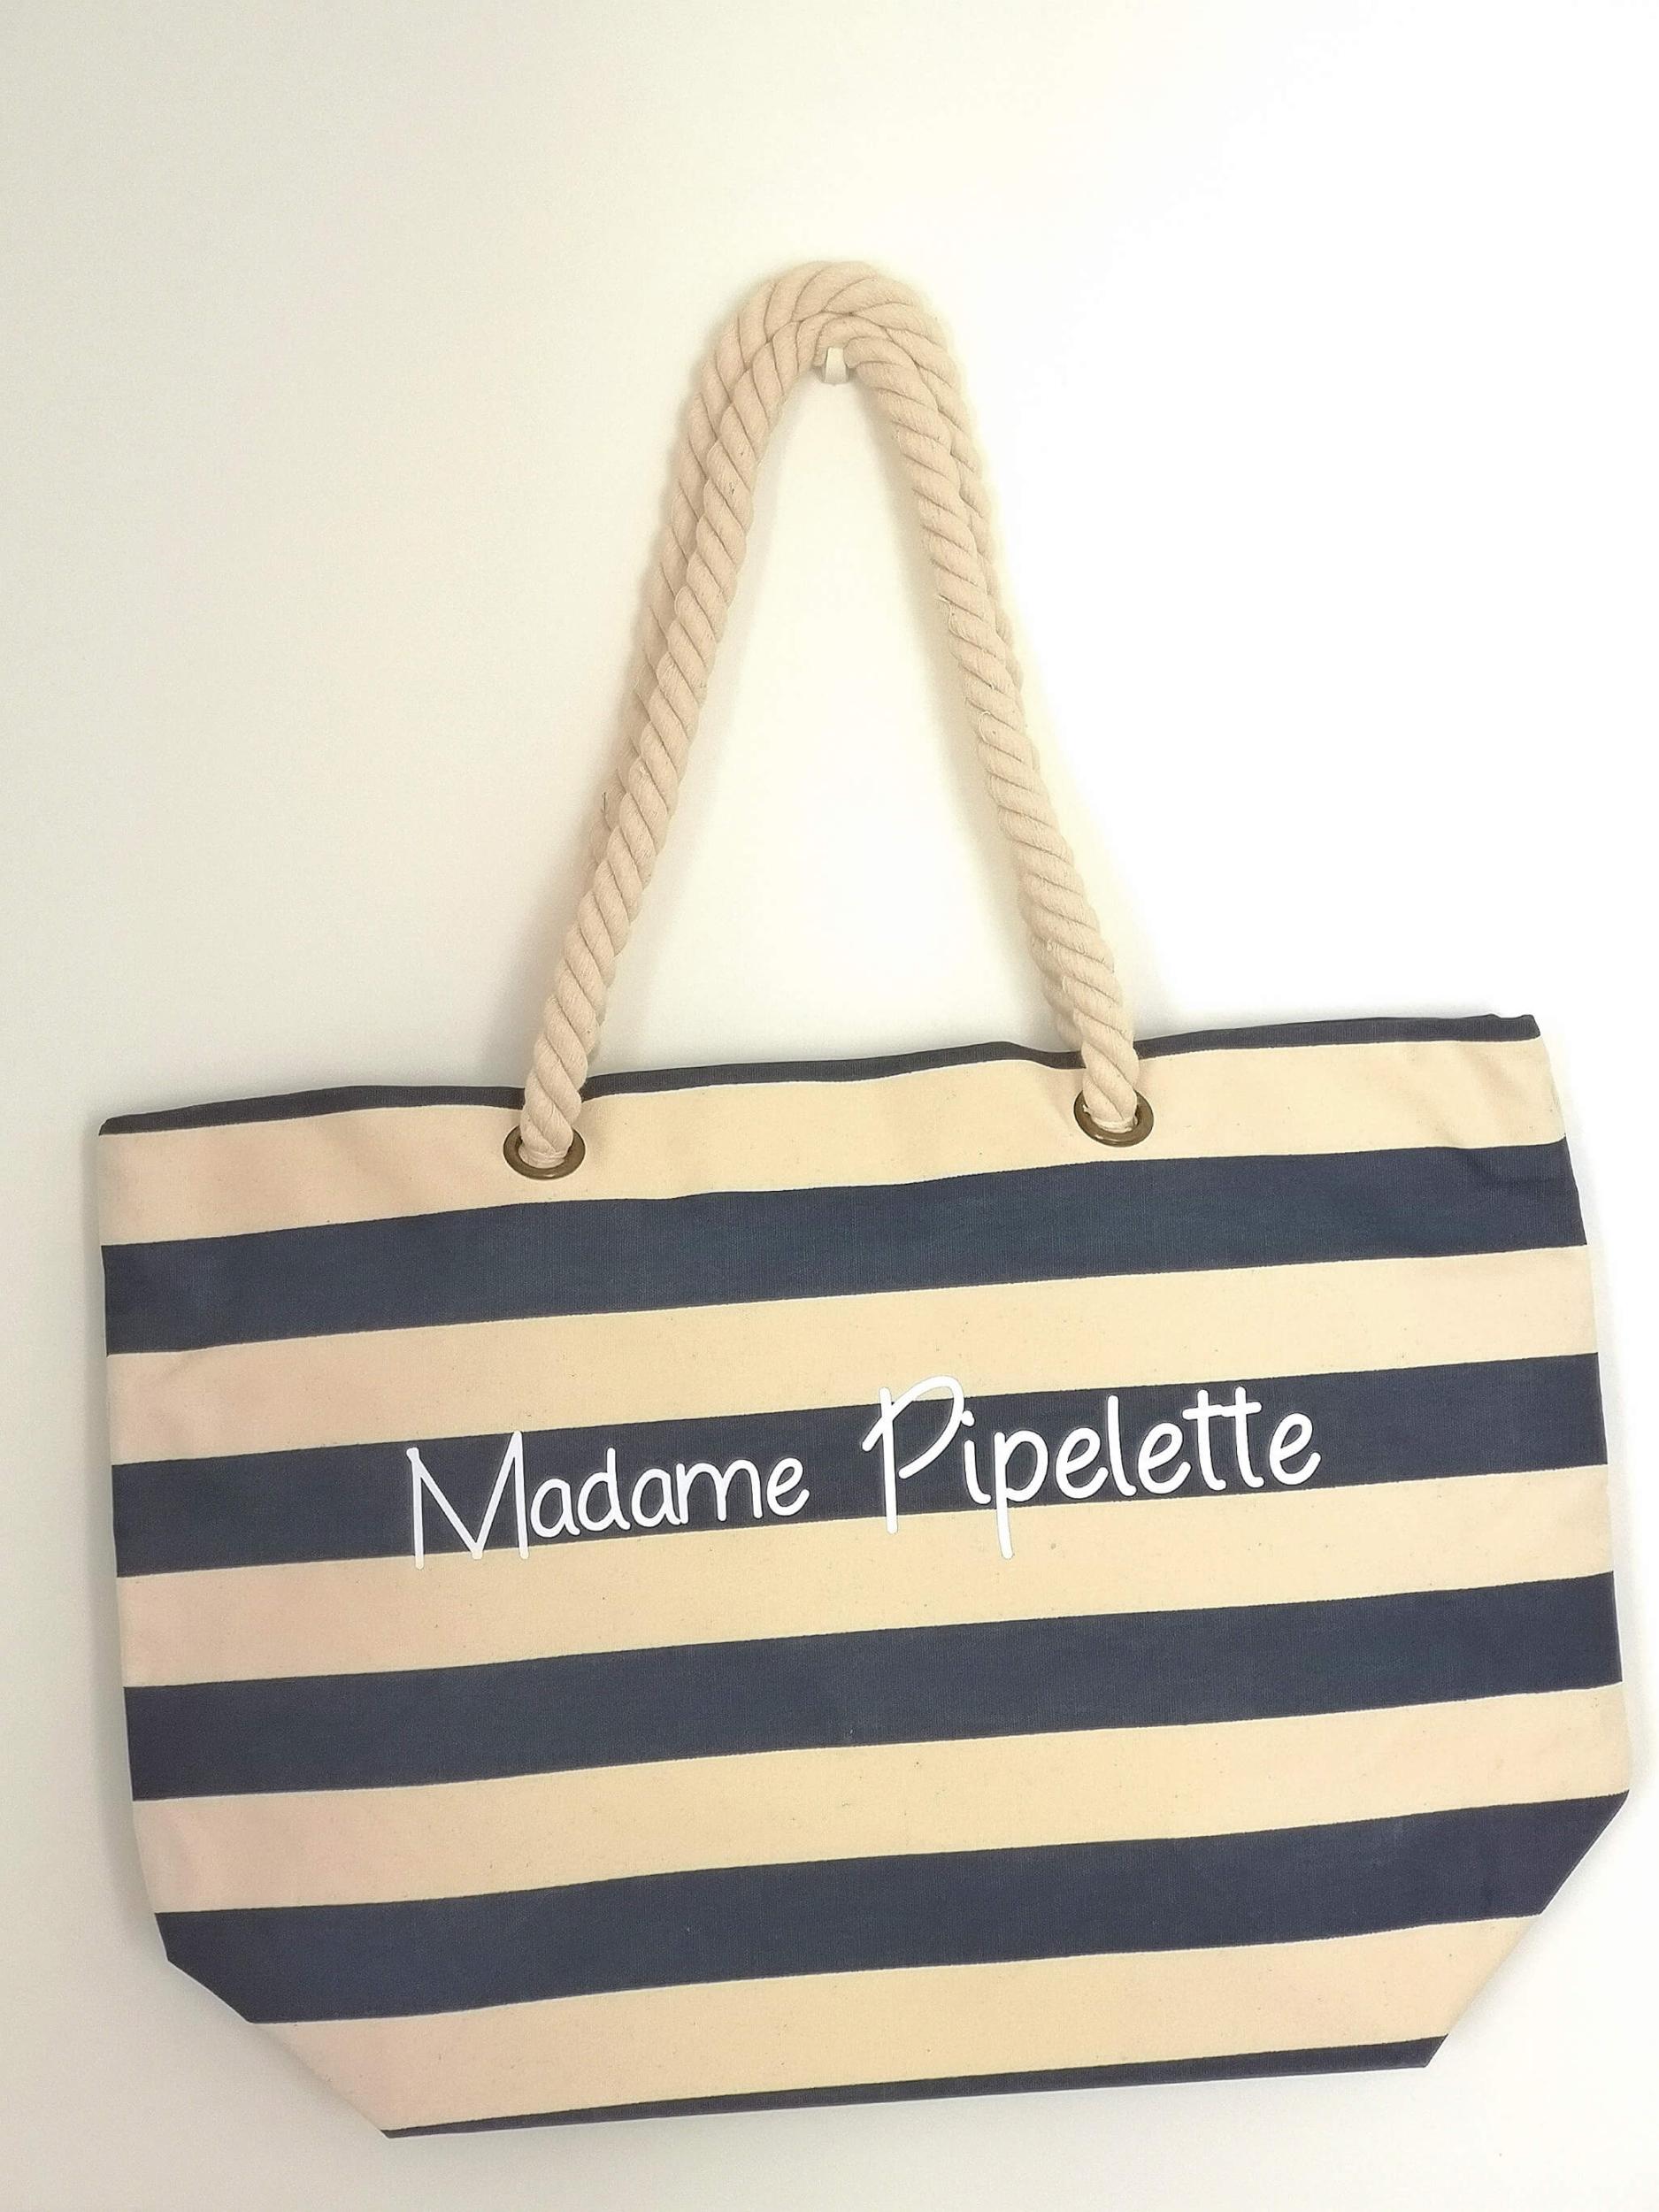 Sac de plage Madame Pipelette